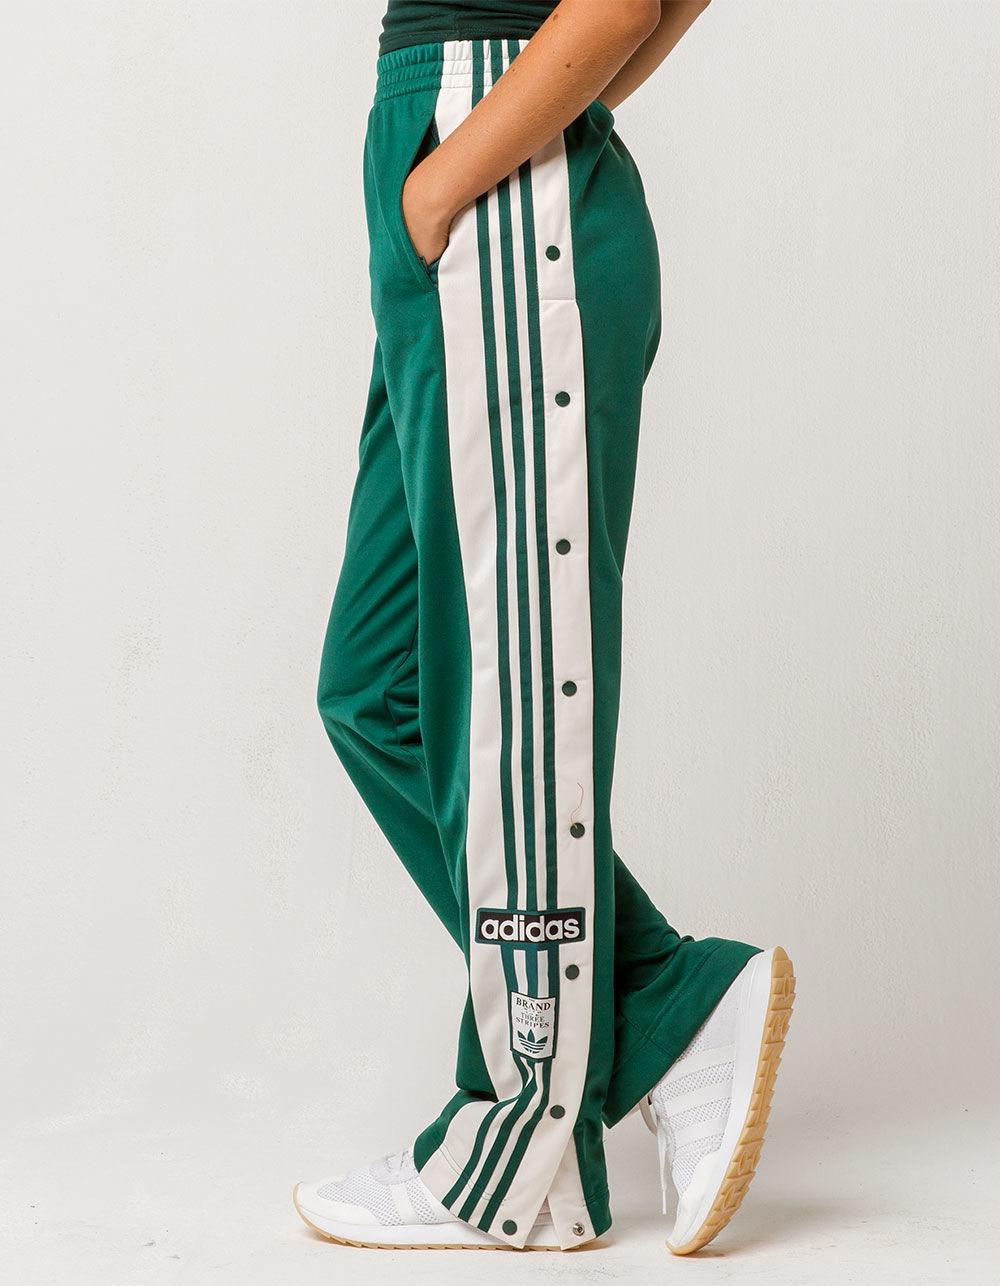 consultor Mediante cura  women's green adidas track pants off 54% - filetrack.nagarpalikanokha.com